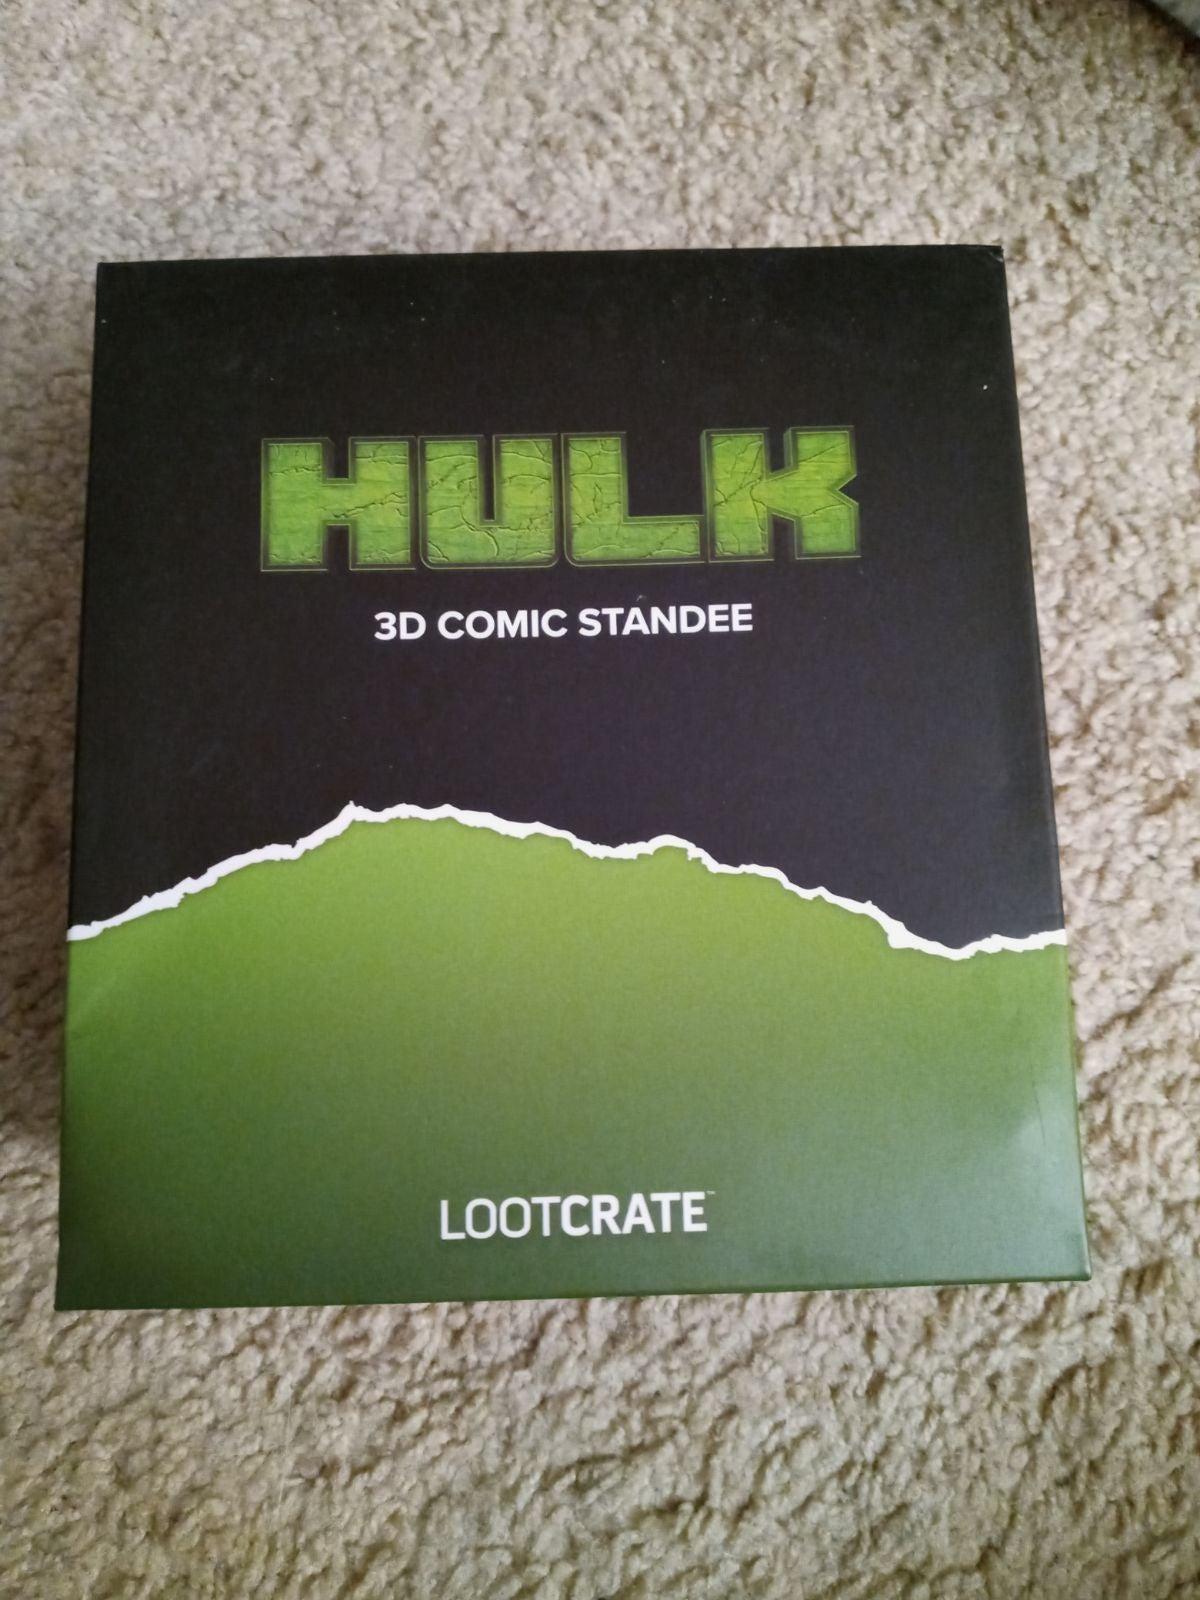 The Incredible Hulk 3D Comic Standee